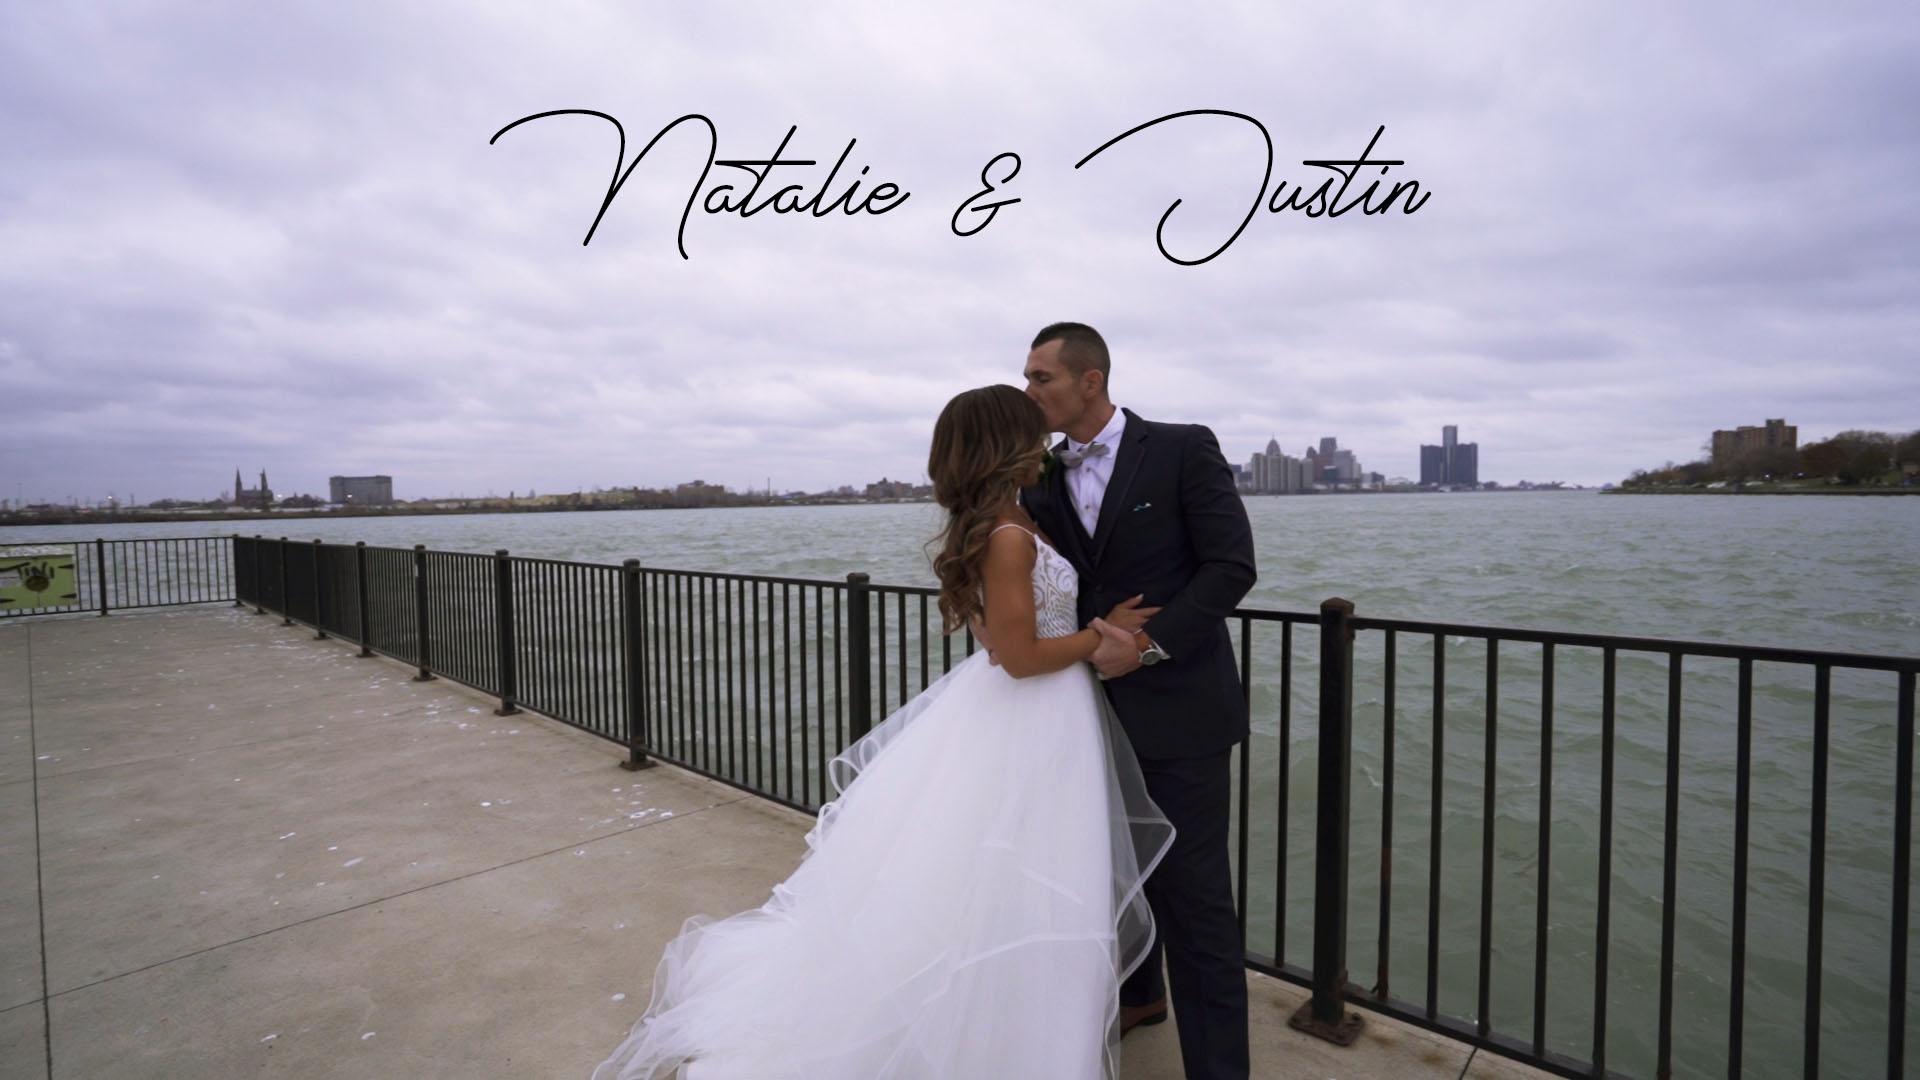 Natalie + Justin   Windsor, Canada   Ambassador Golf Club